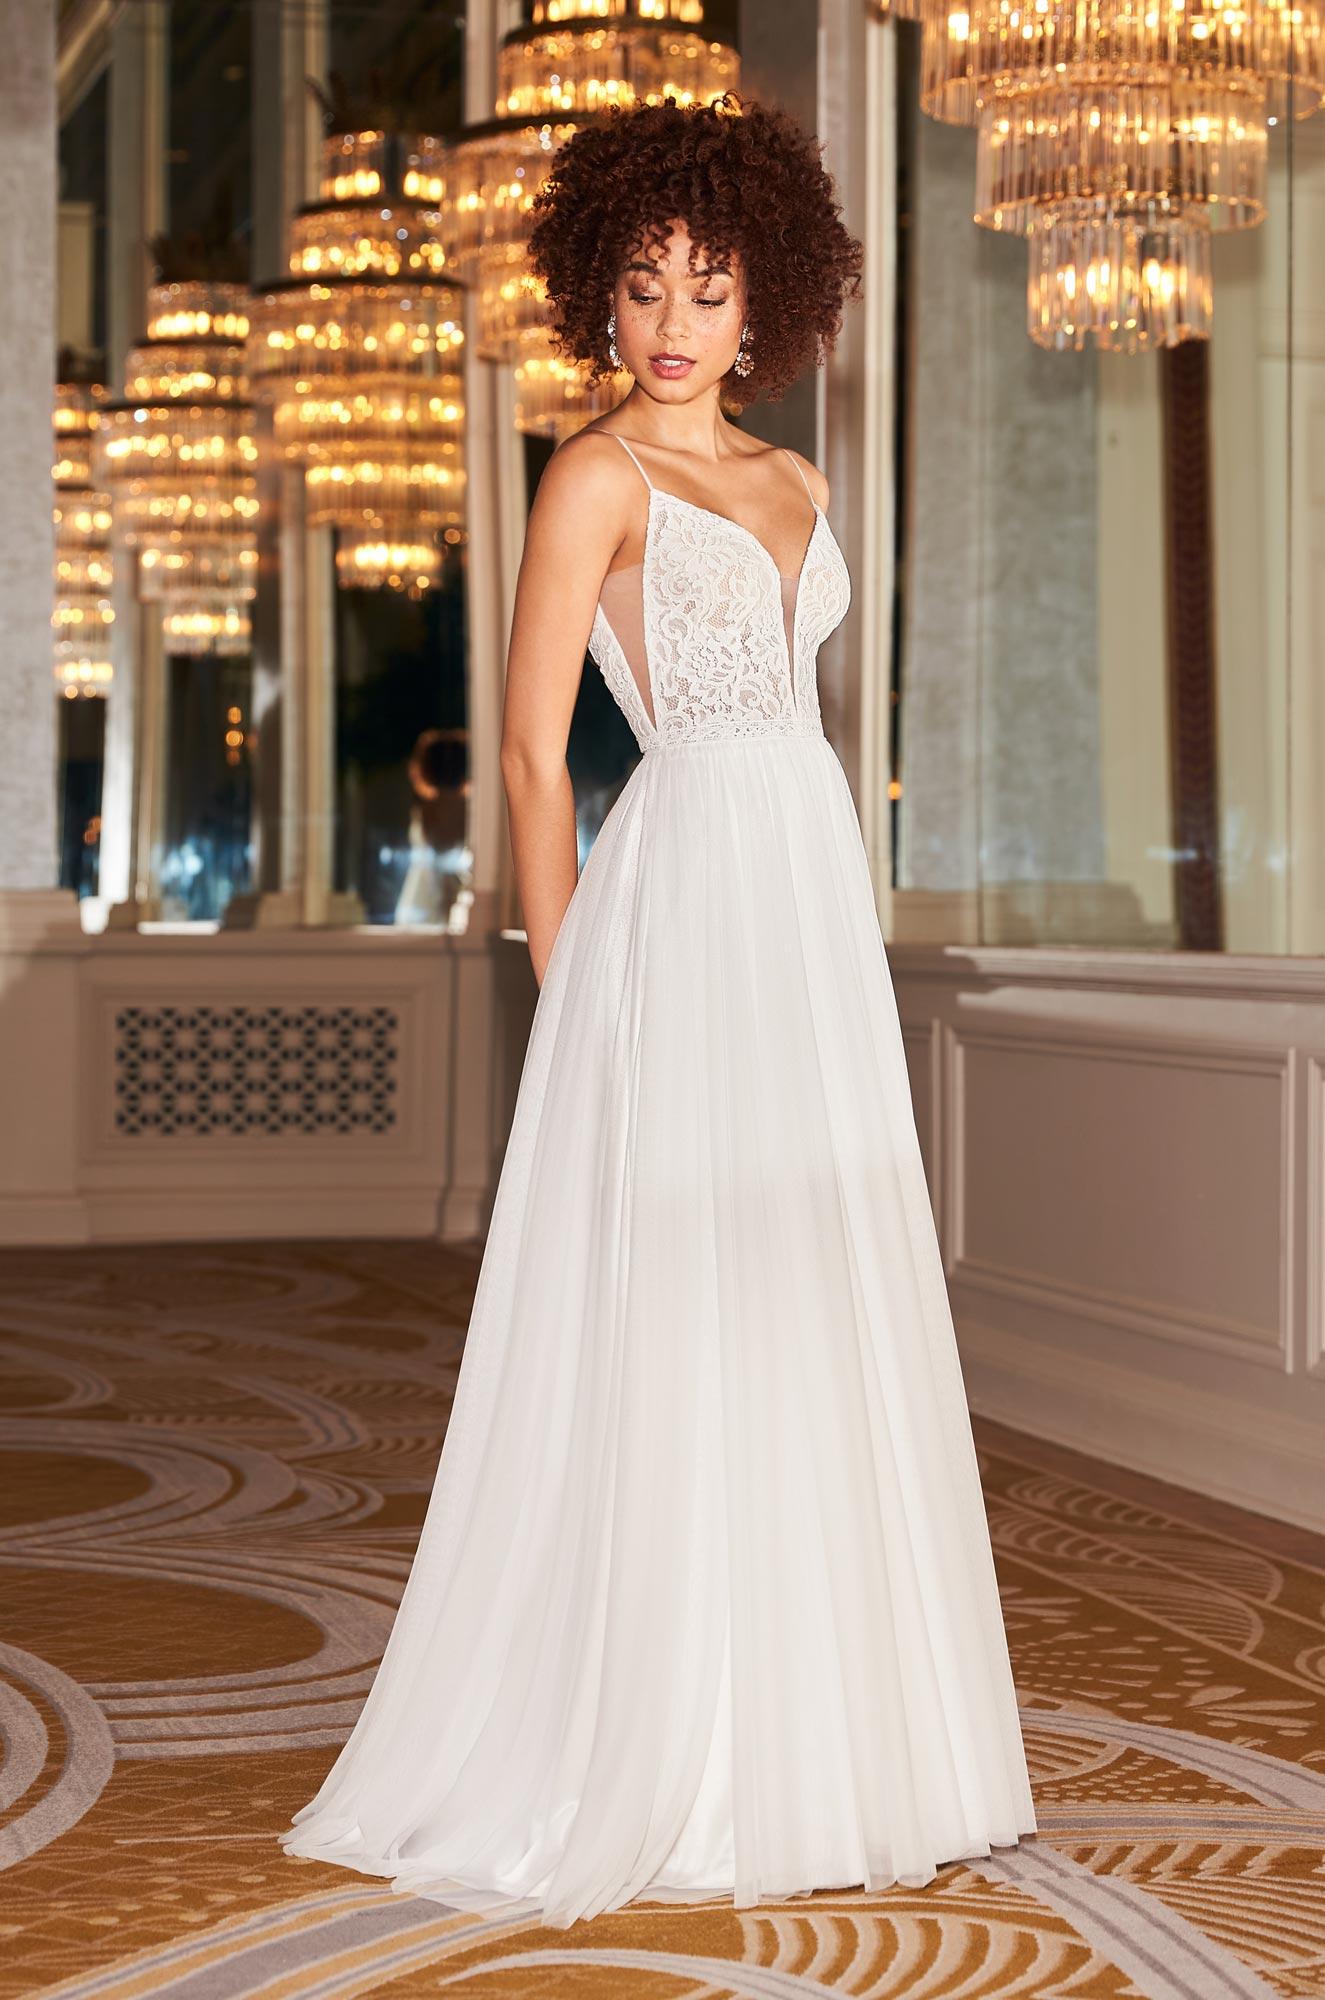 Graceful Tulle Wedding Dress - Style #2360   Mikaella Bridal